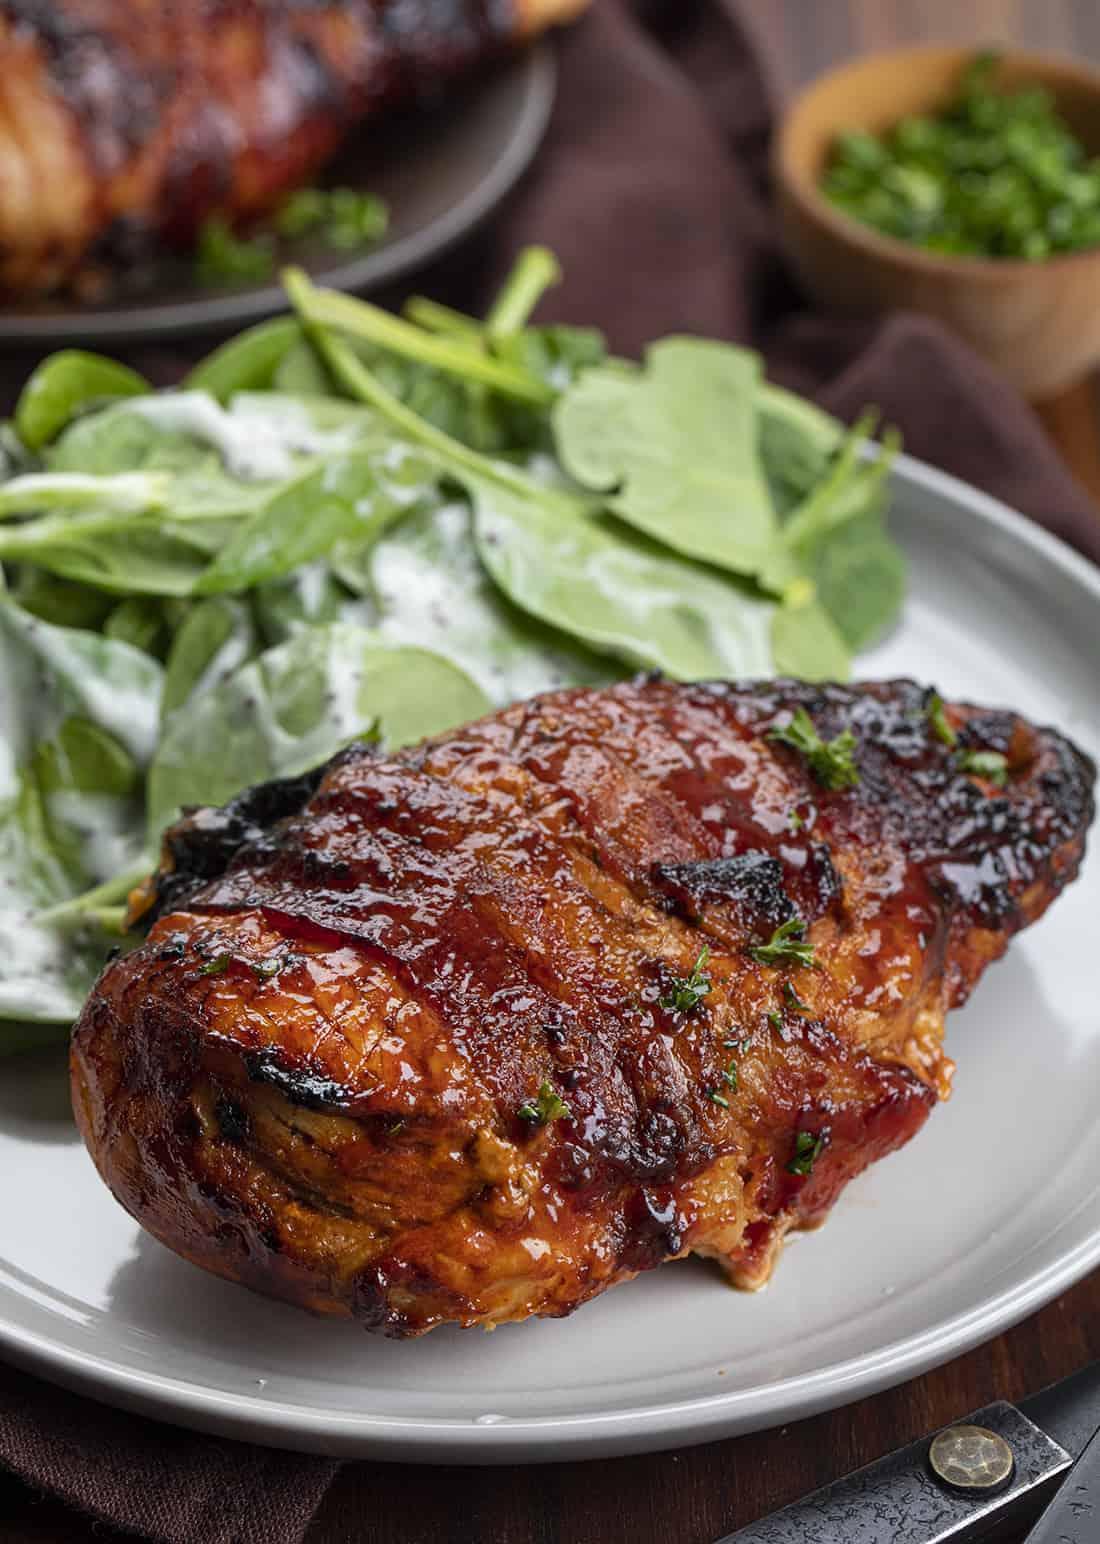 One Air Fryer BBQ Stuffed Chicken on Plate